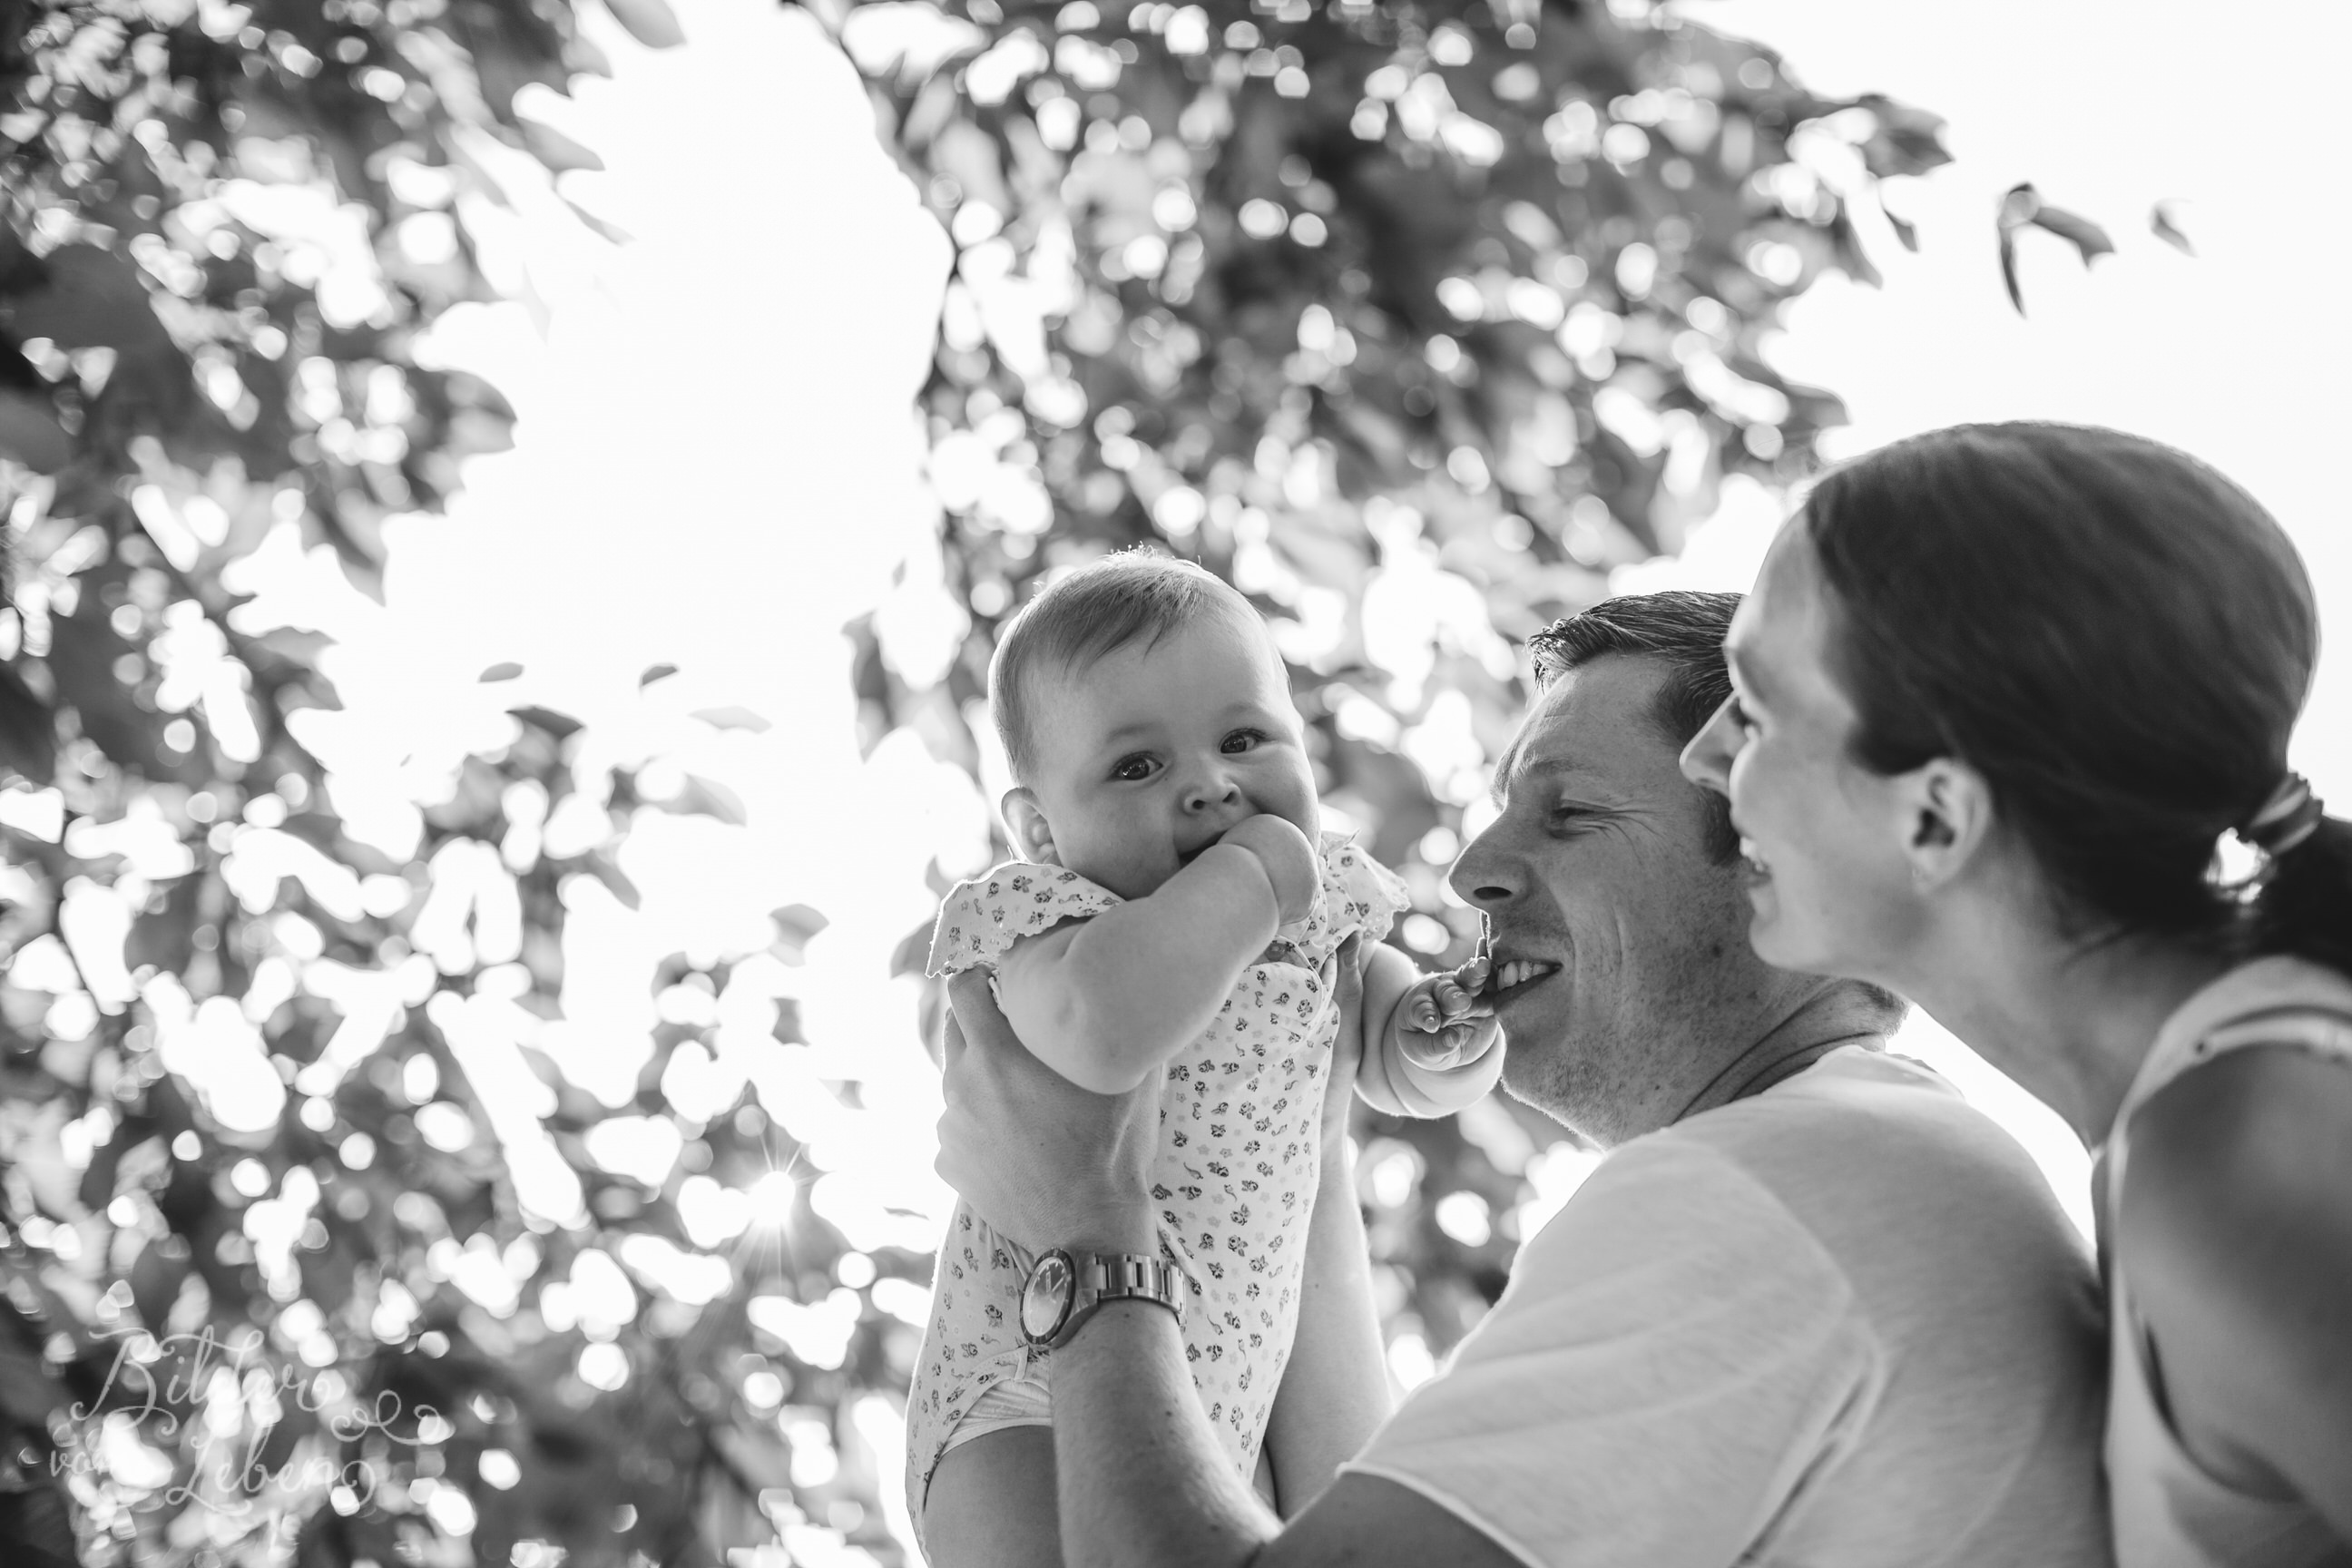 Greta-Labrador-Kinder-Portraits-BildervomLeben-2016-8365